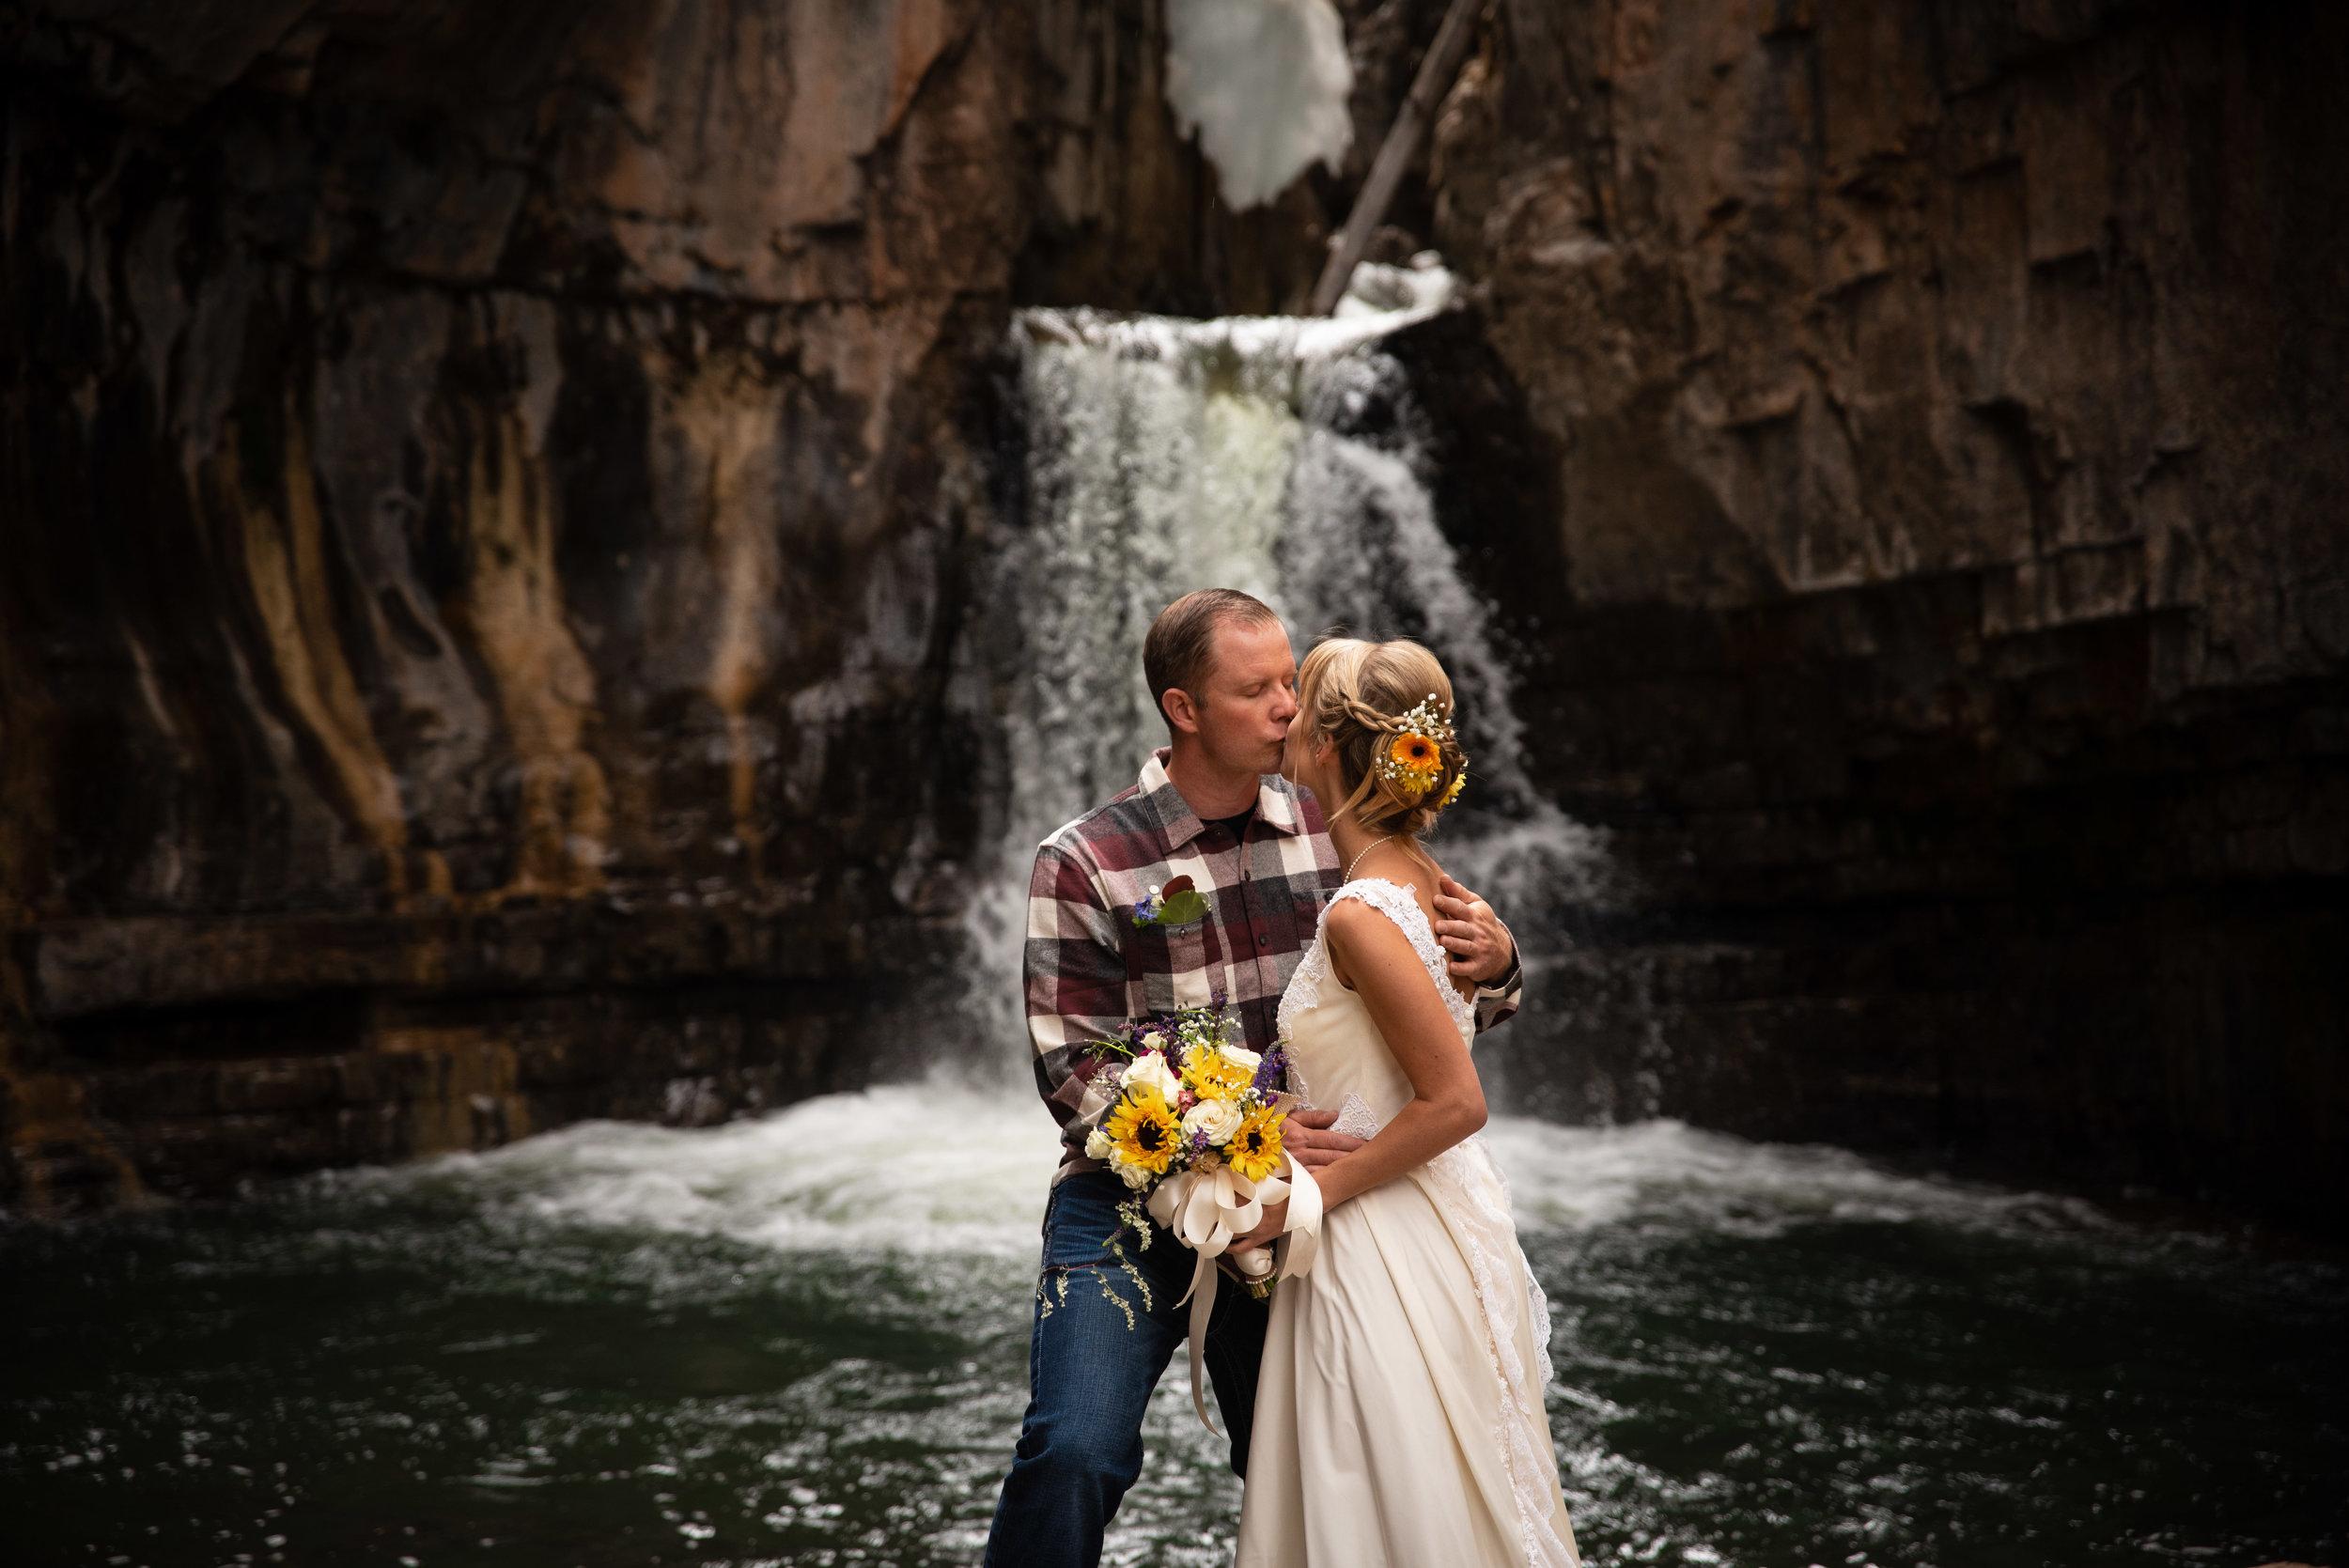 Monika B. Leopold Wedding Photography // Durango, Colorado